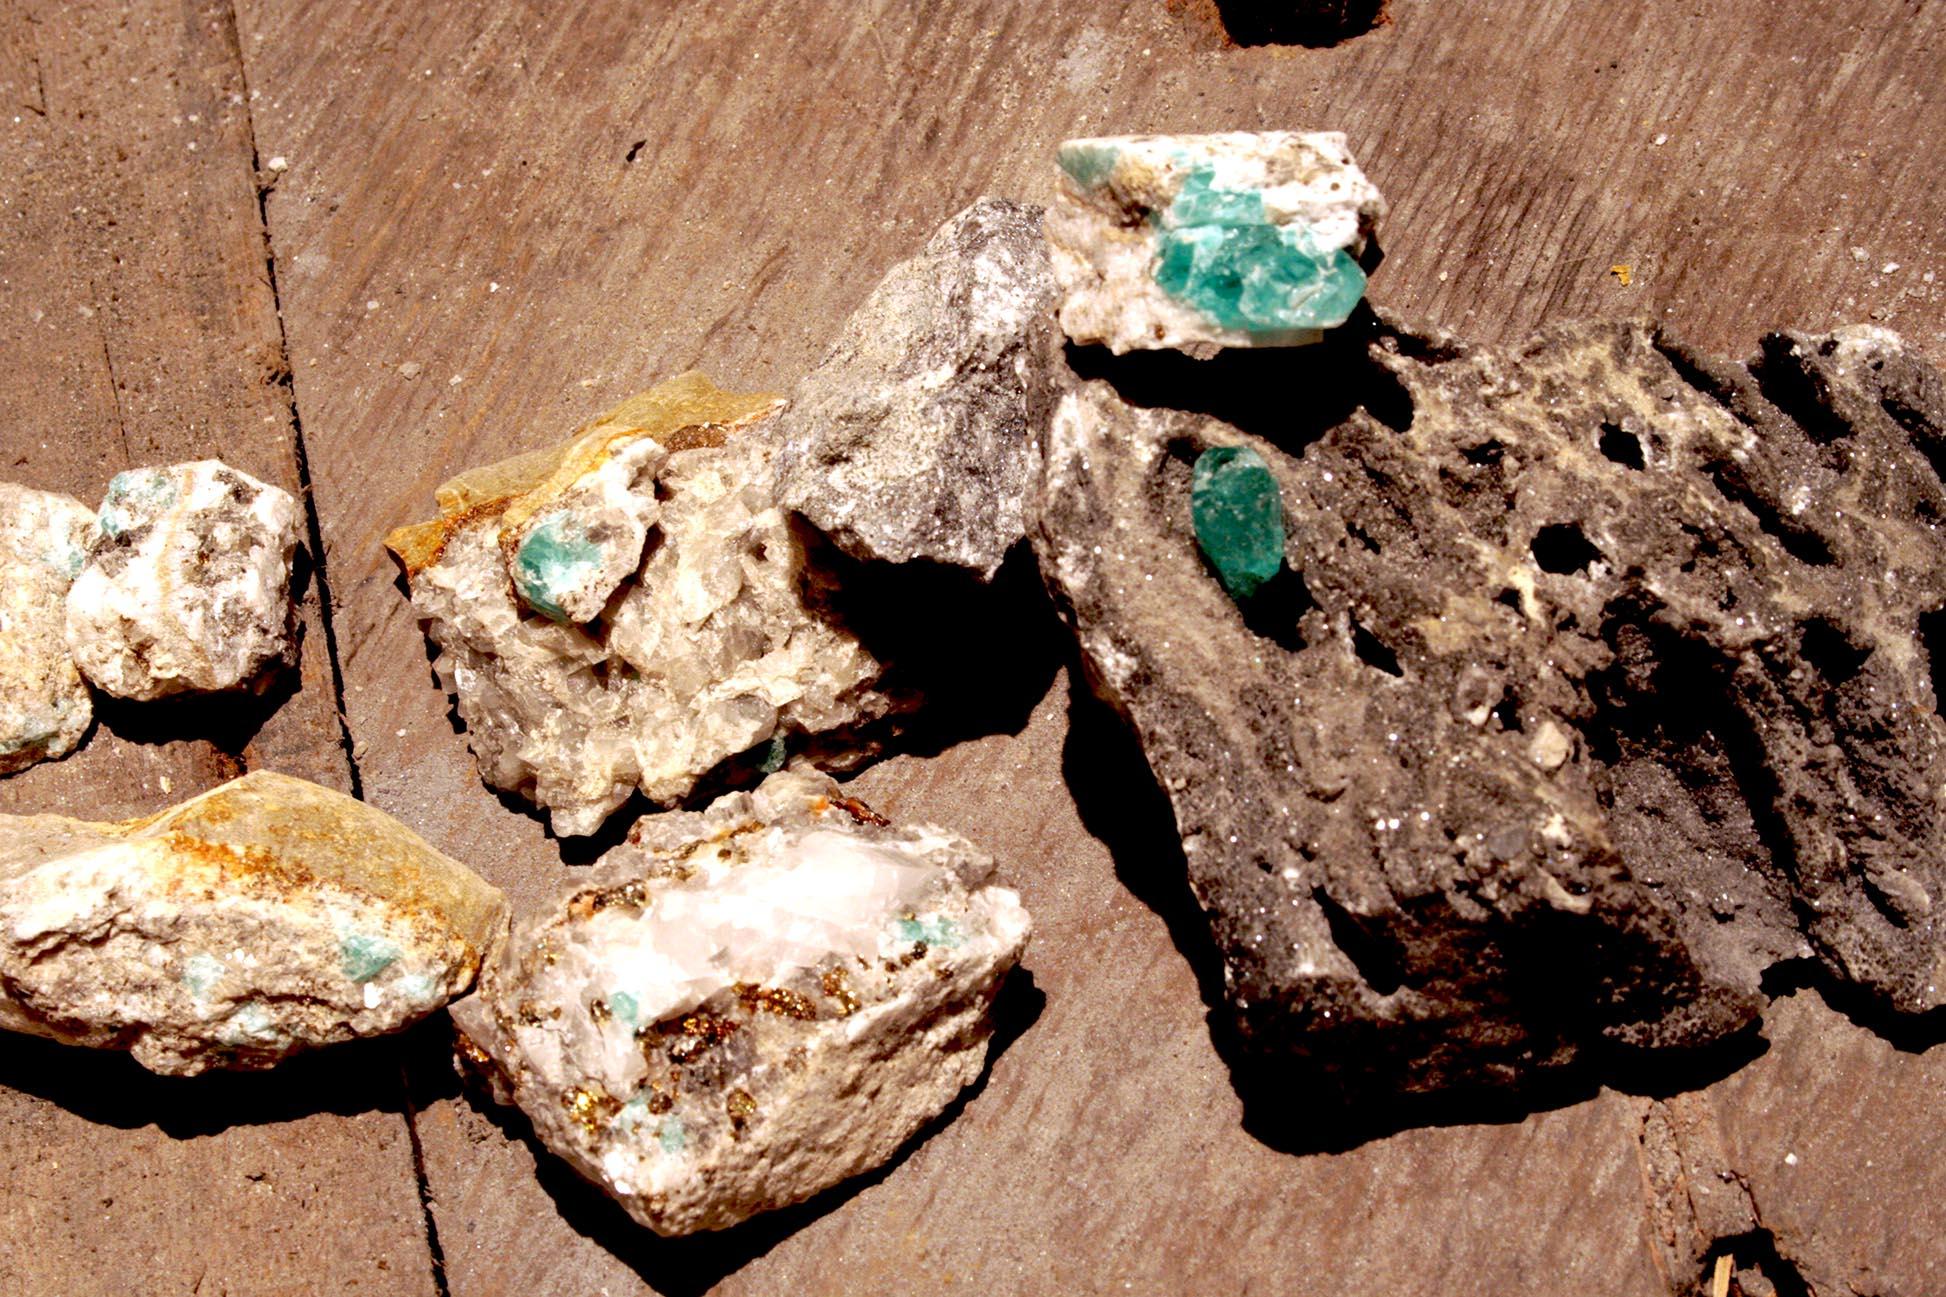 Honoka's Previous ExhibitionsRaw Emerald Mining with Honoka